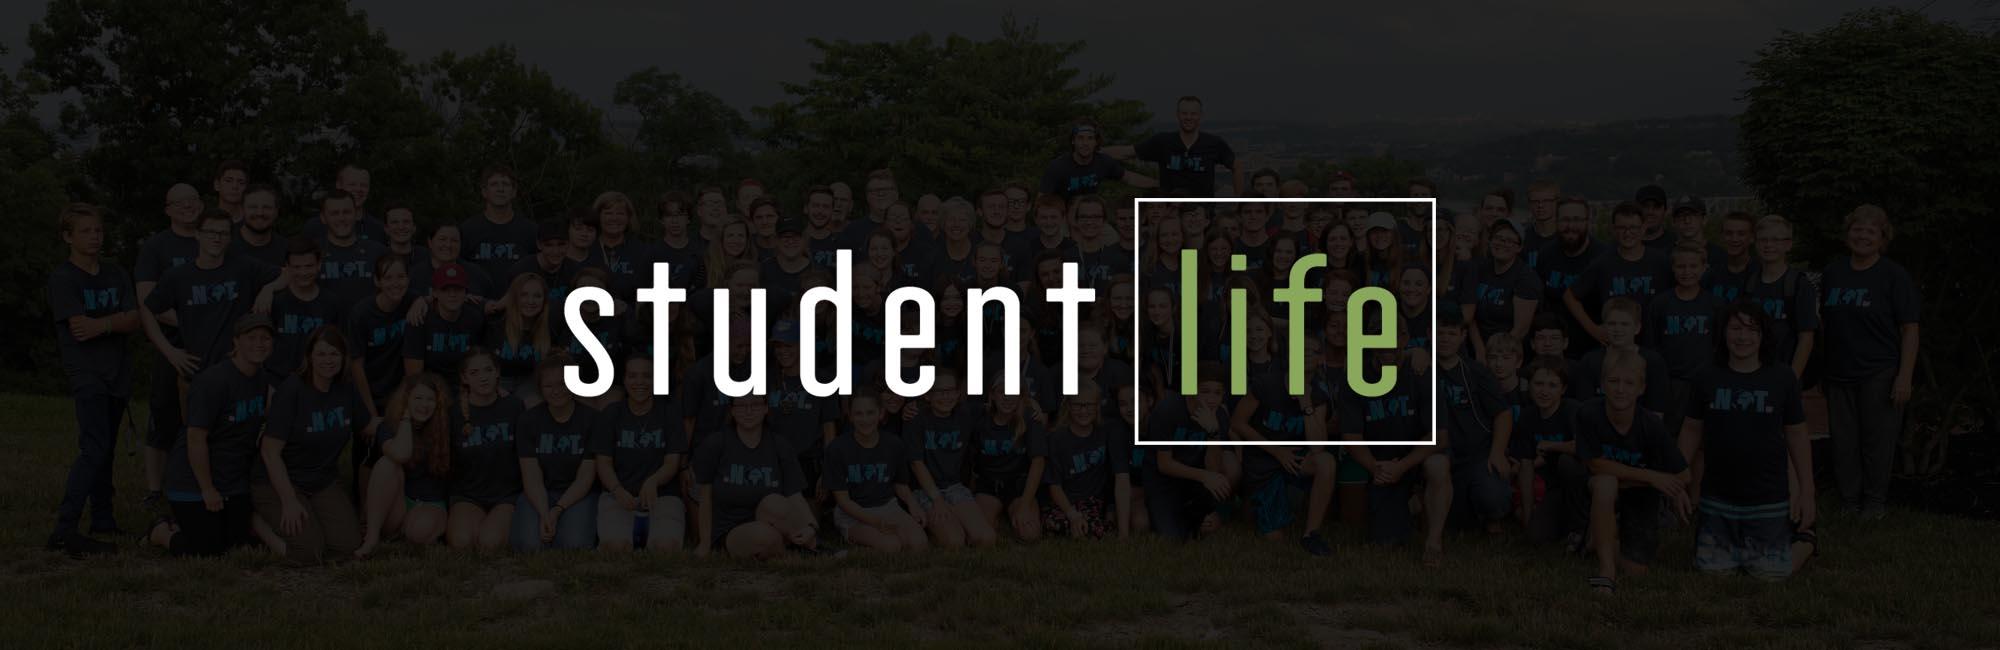 Student Life - Web Header2